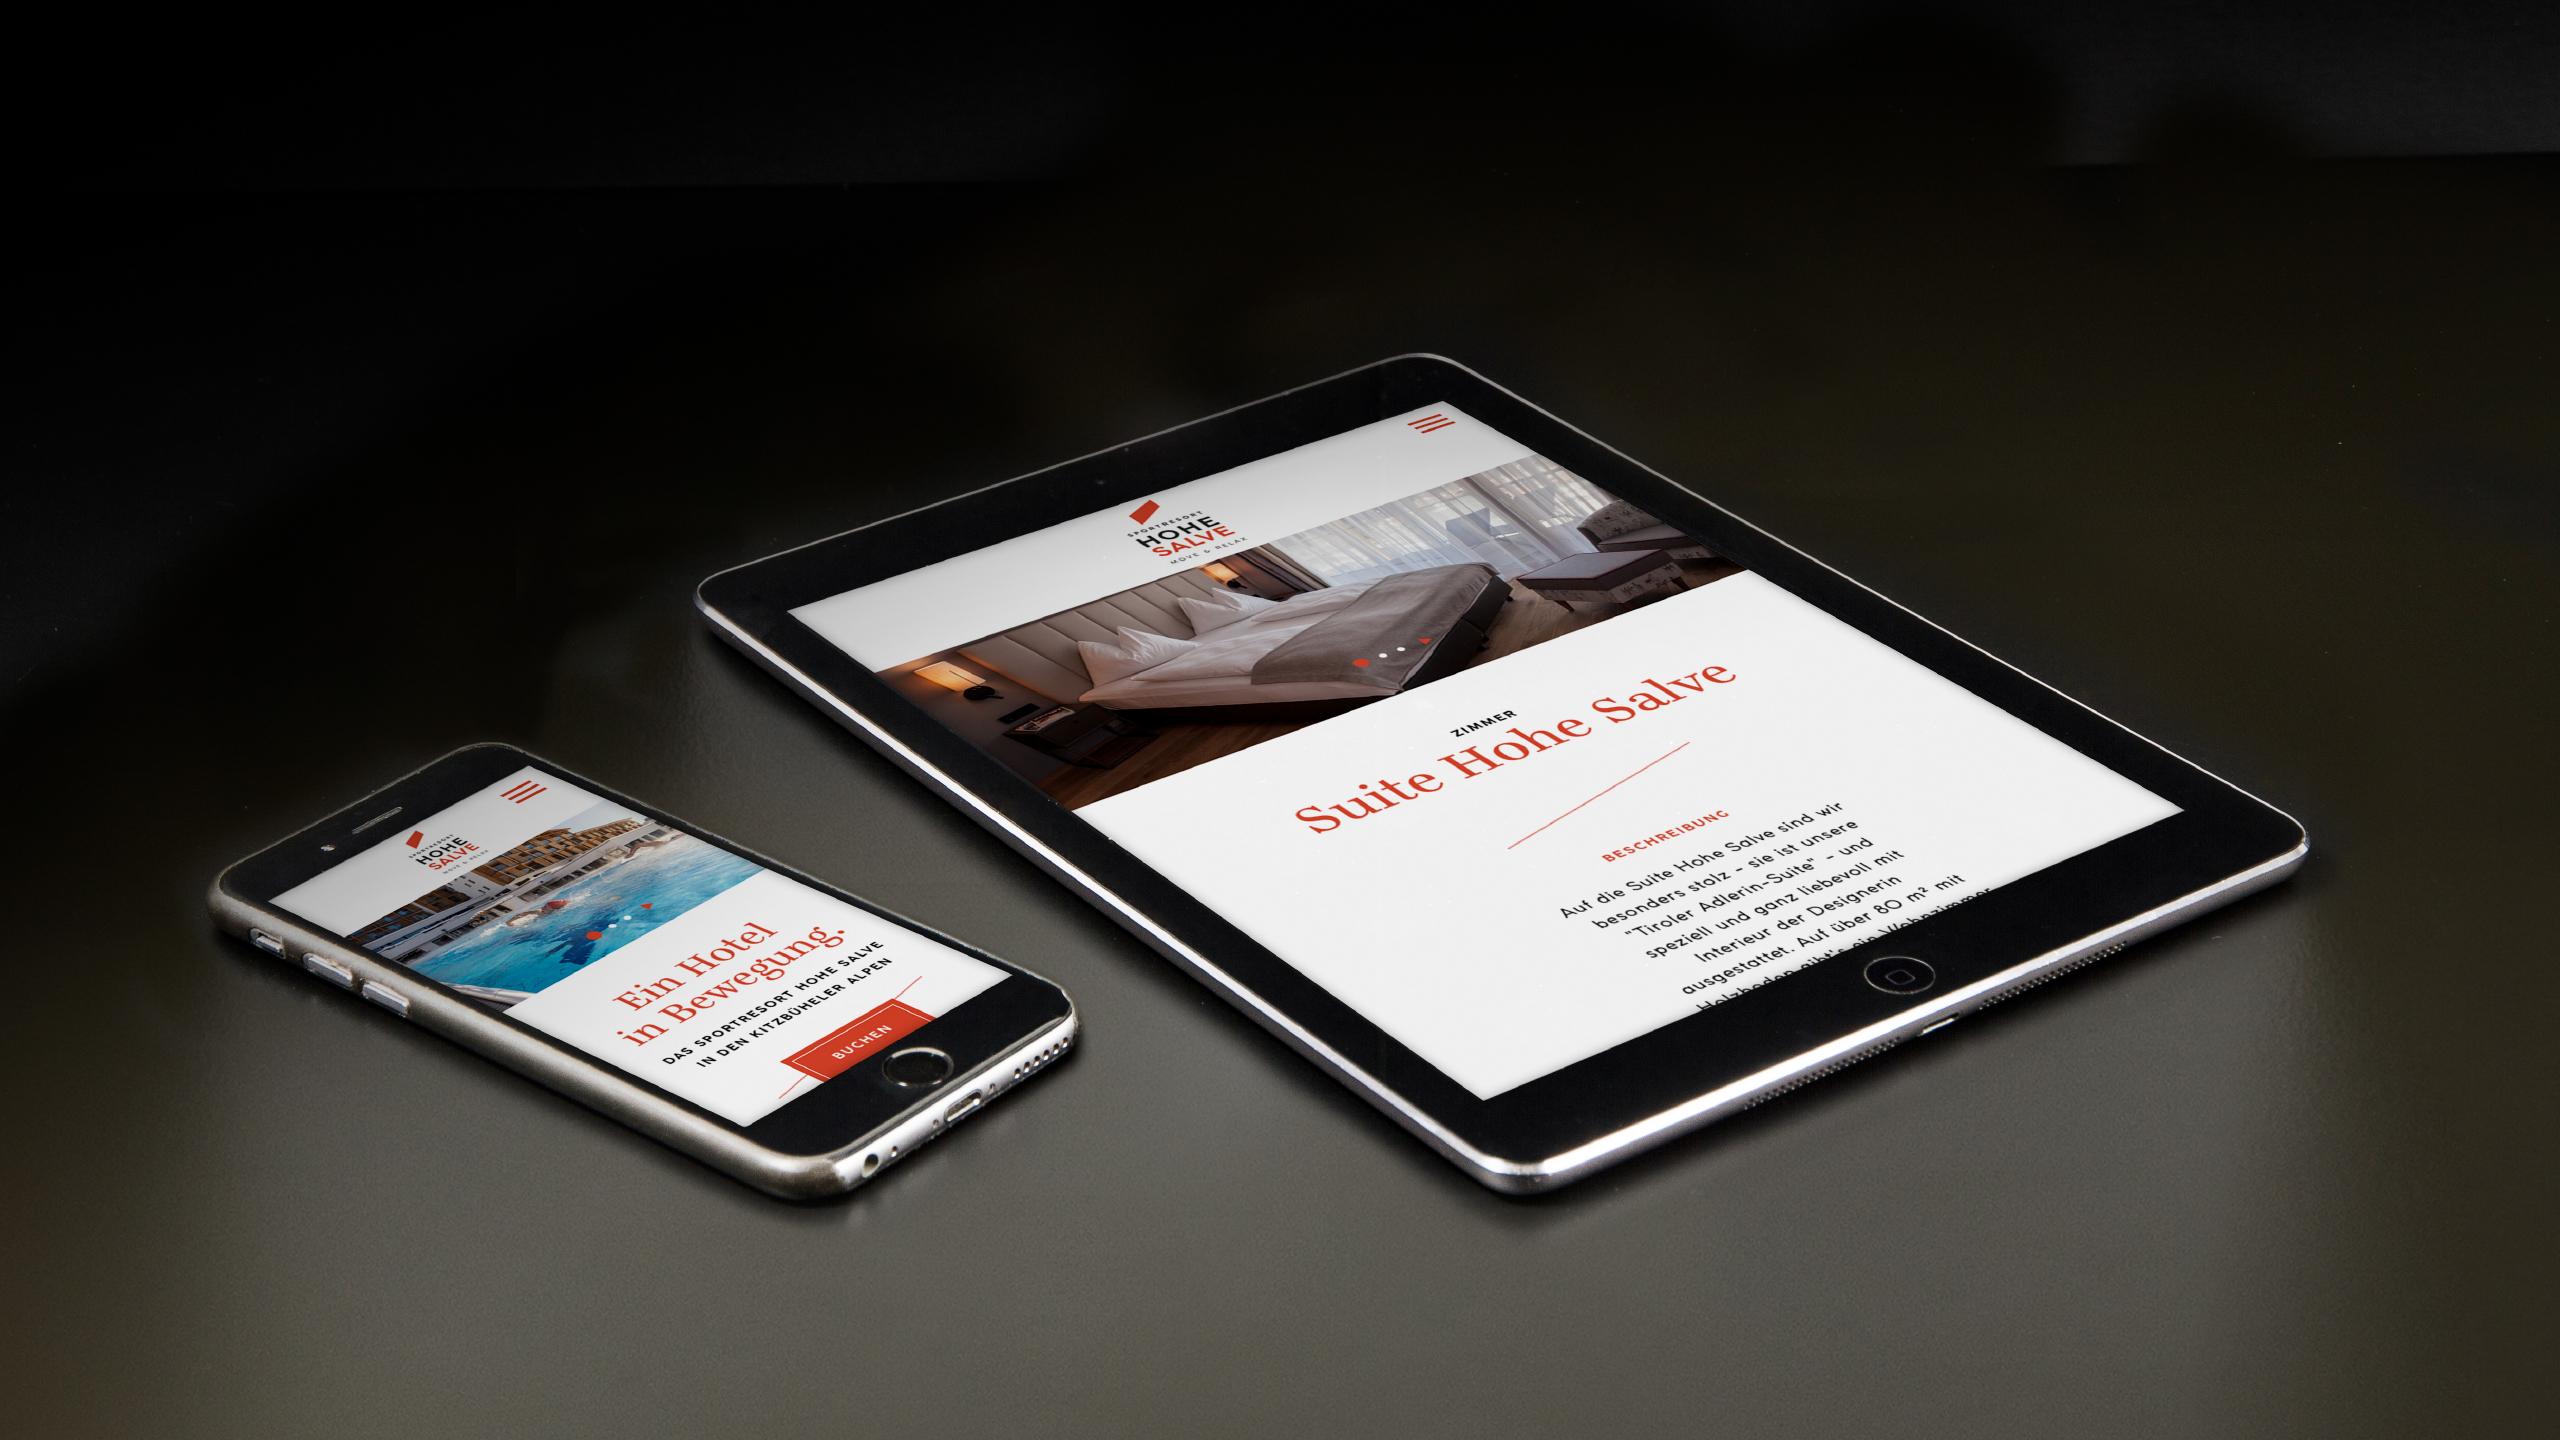 Ref Hohe Salve 29 Responsive Webdesign